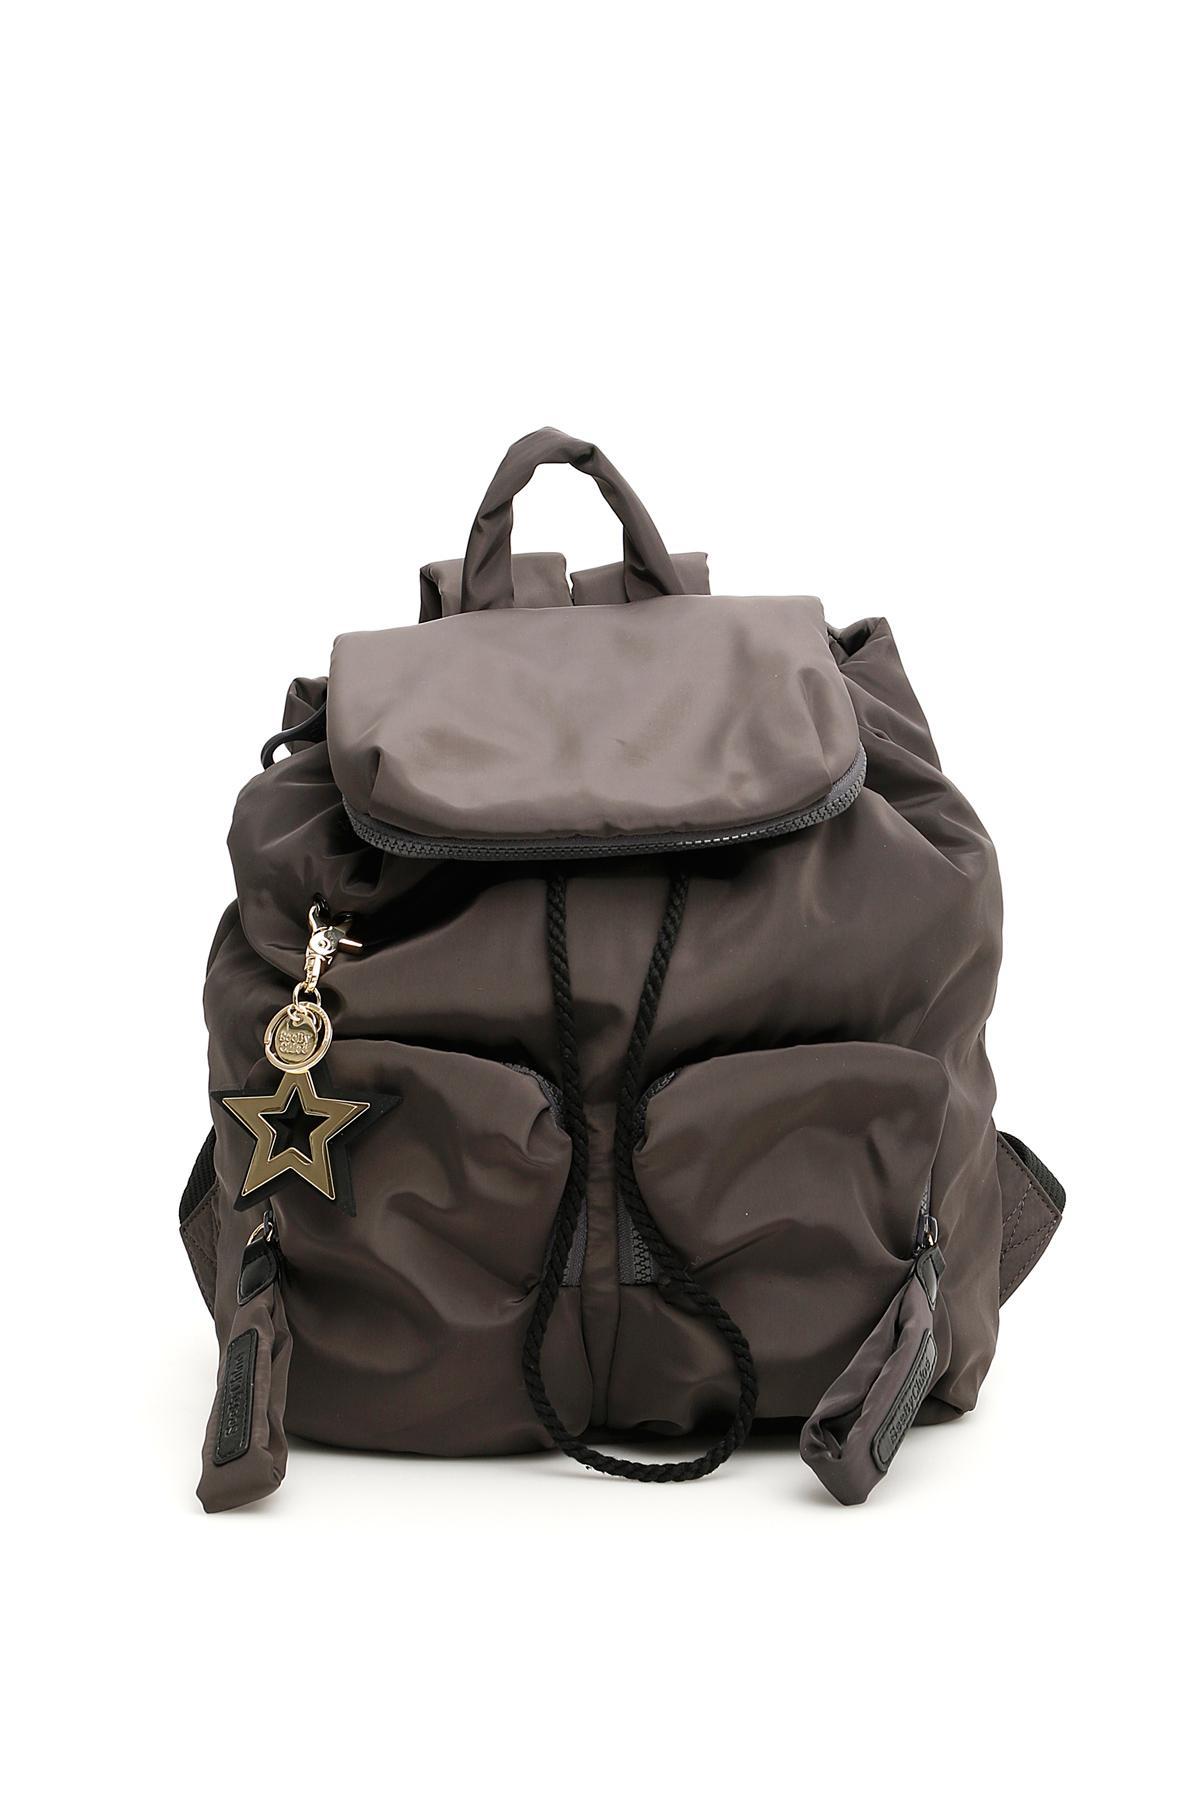 See By Chloé - Gray Large Joy Rider Backpack - Lyst. View fullscreen a4df480eba79d